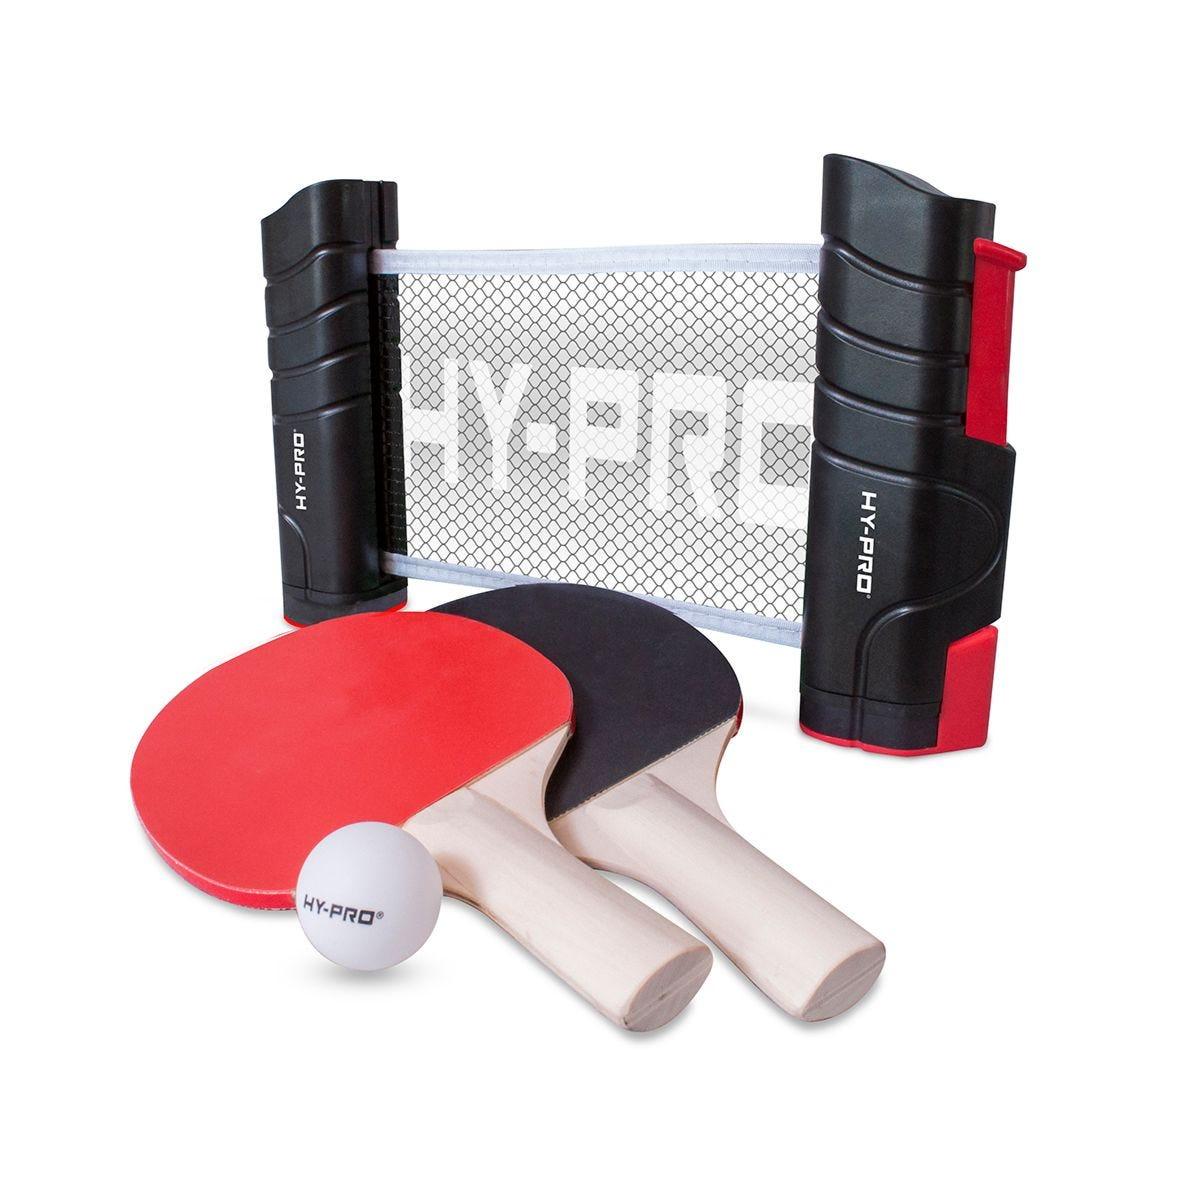 Hy-Pro Portable Table Tennis Set